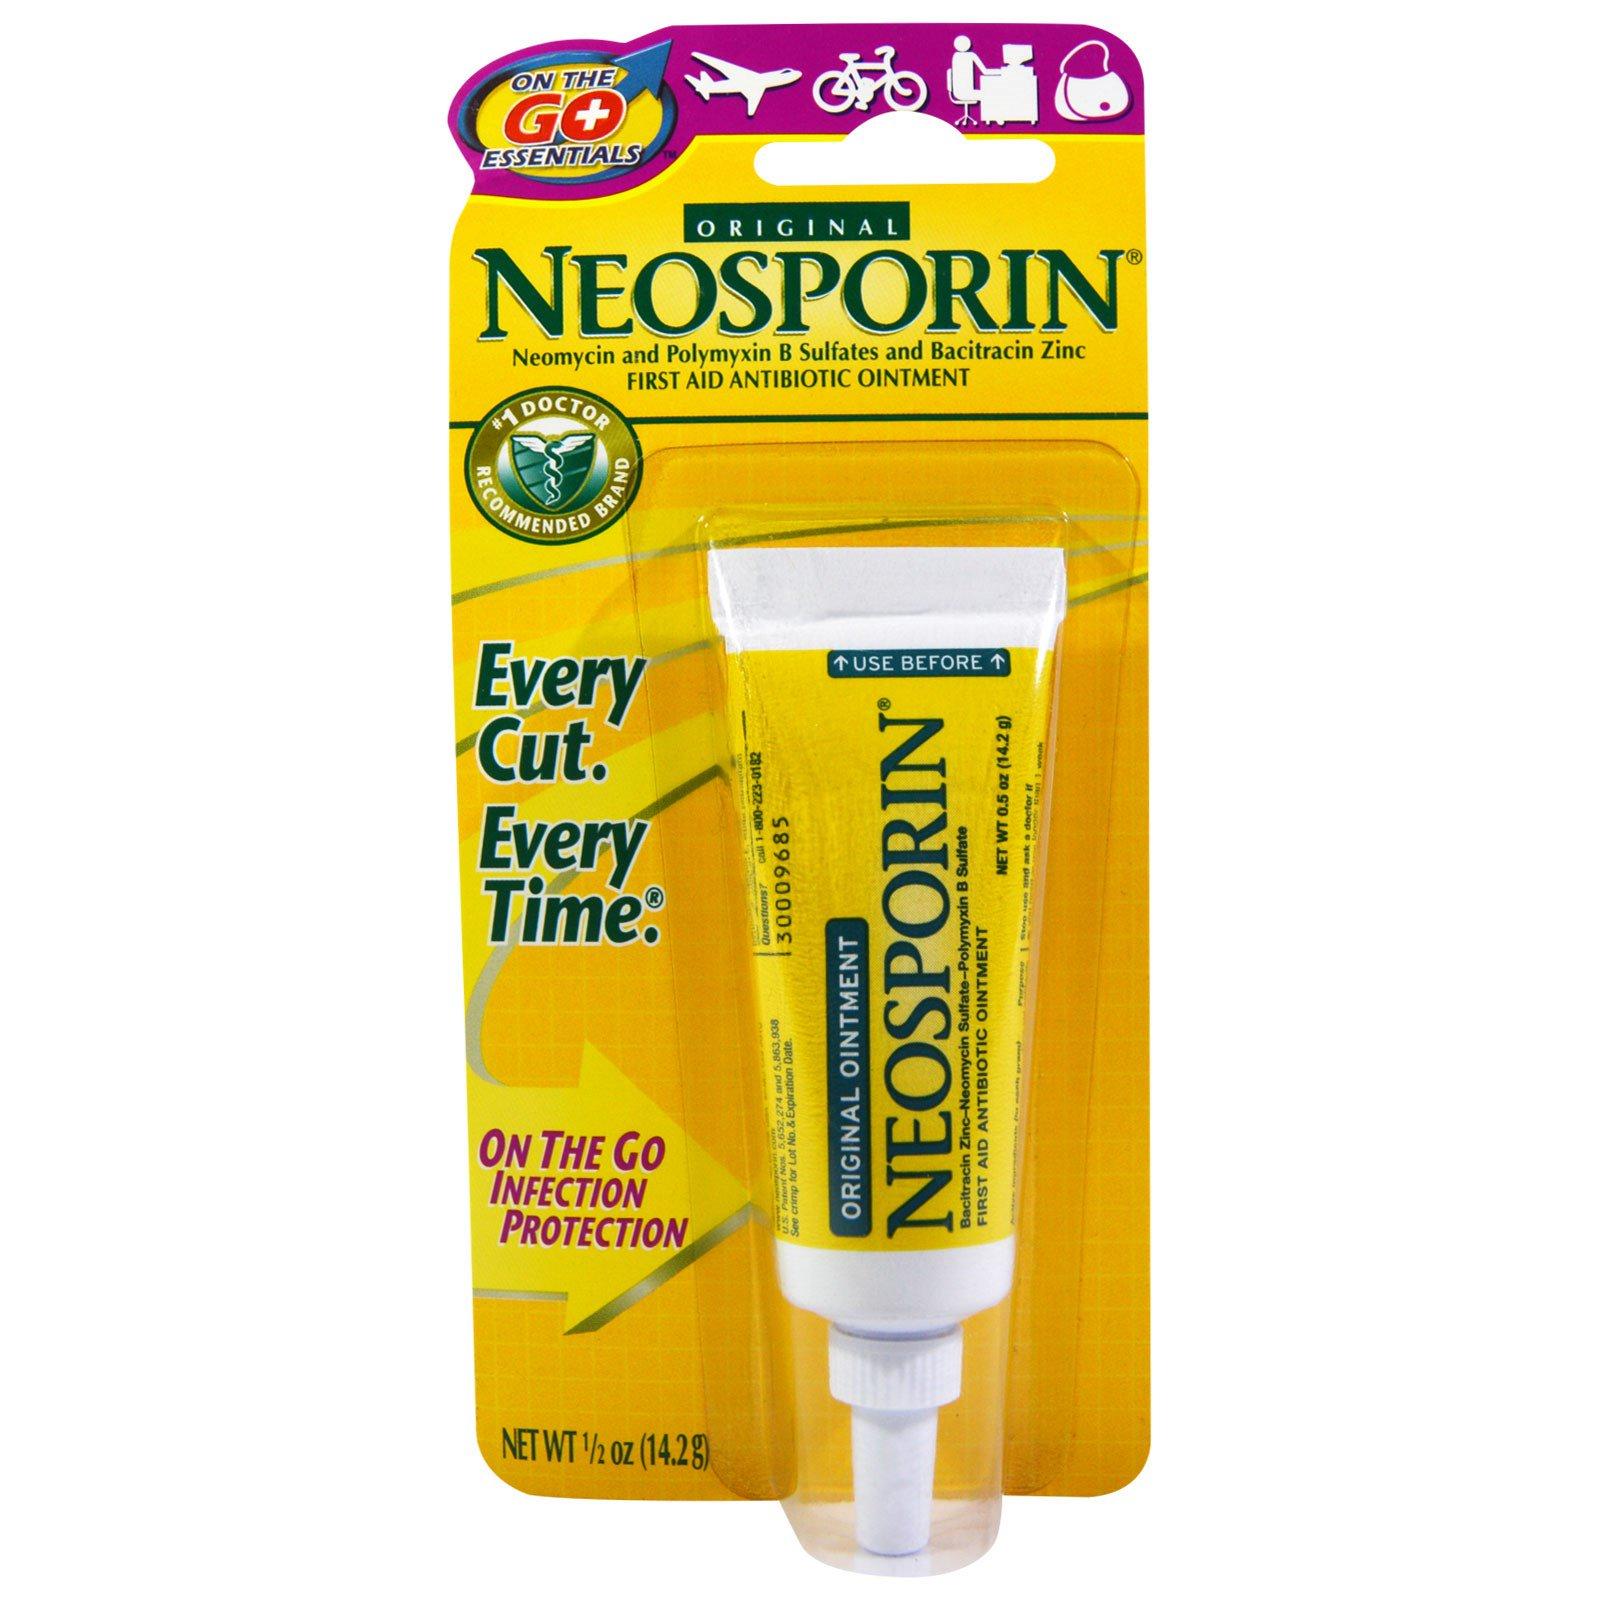 Neosporin. 急救抗生素軟膏。原裝。1/2盎司(14.2克) - iHerb